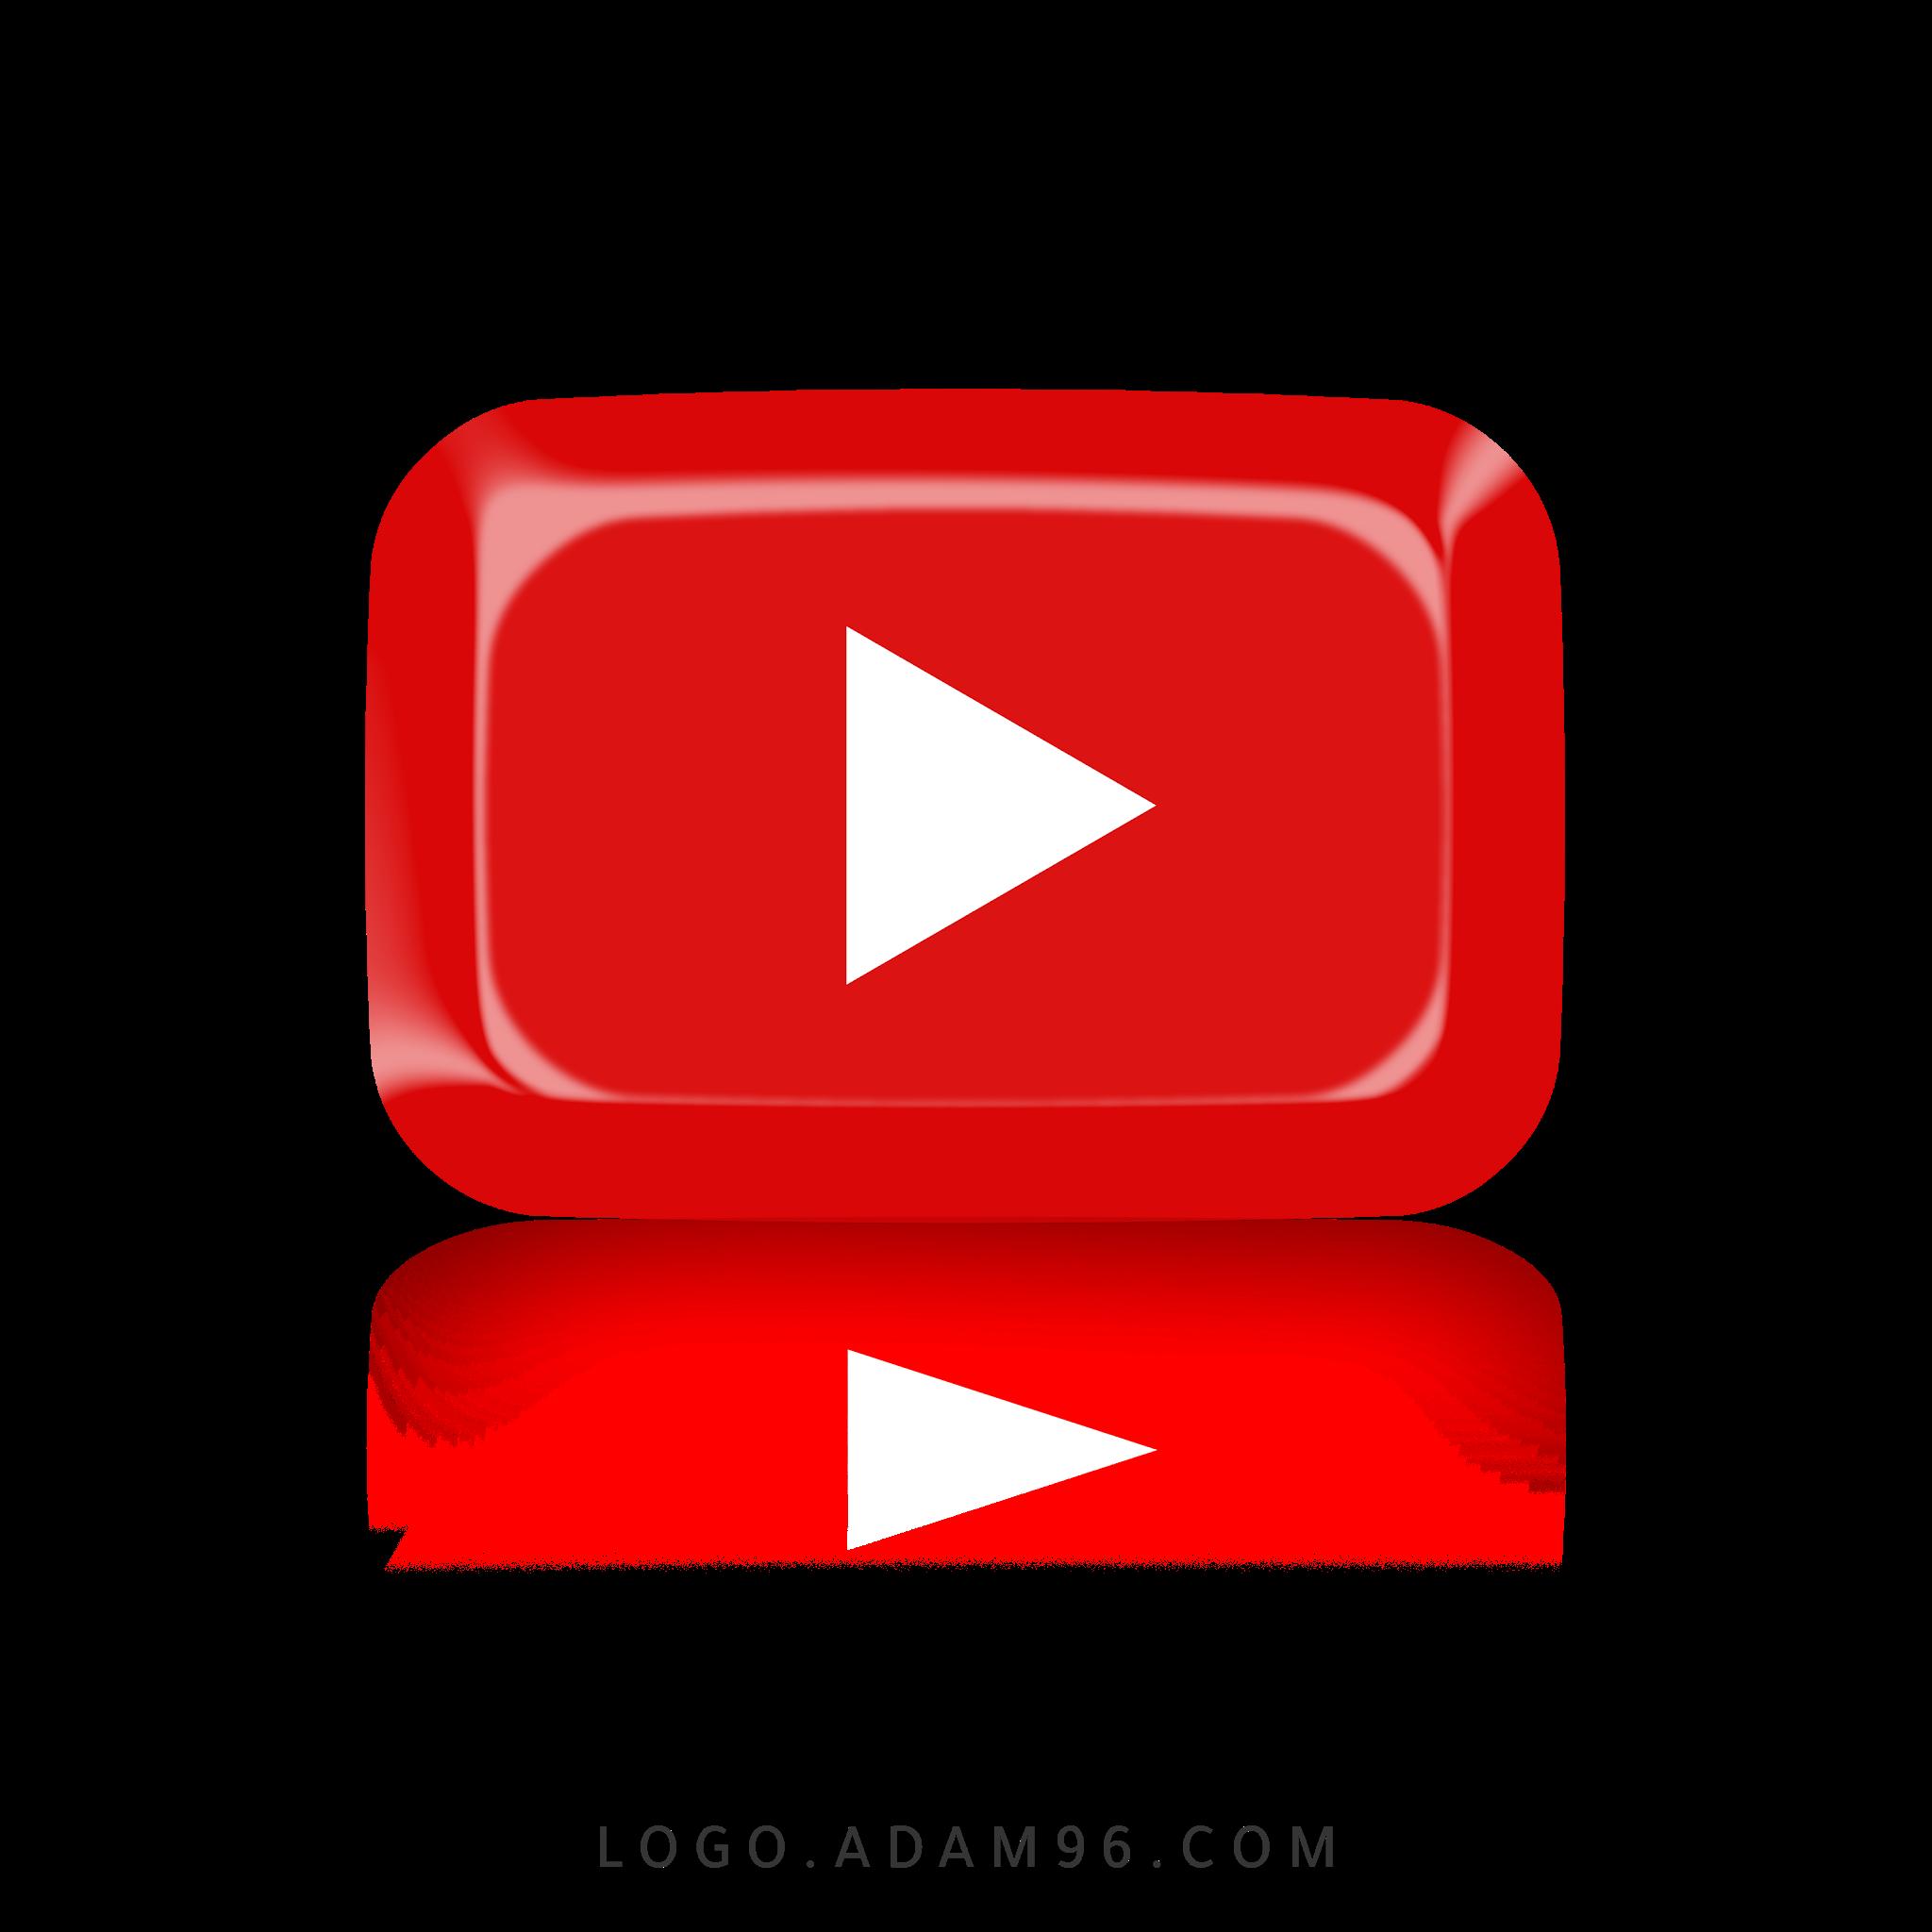 تحميل شعار يوتيوب احمر لوجو يوتيوب بصيغة شفافة Logo YouTube PNG